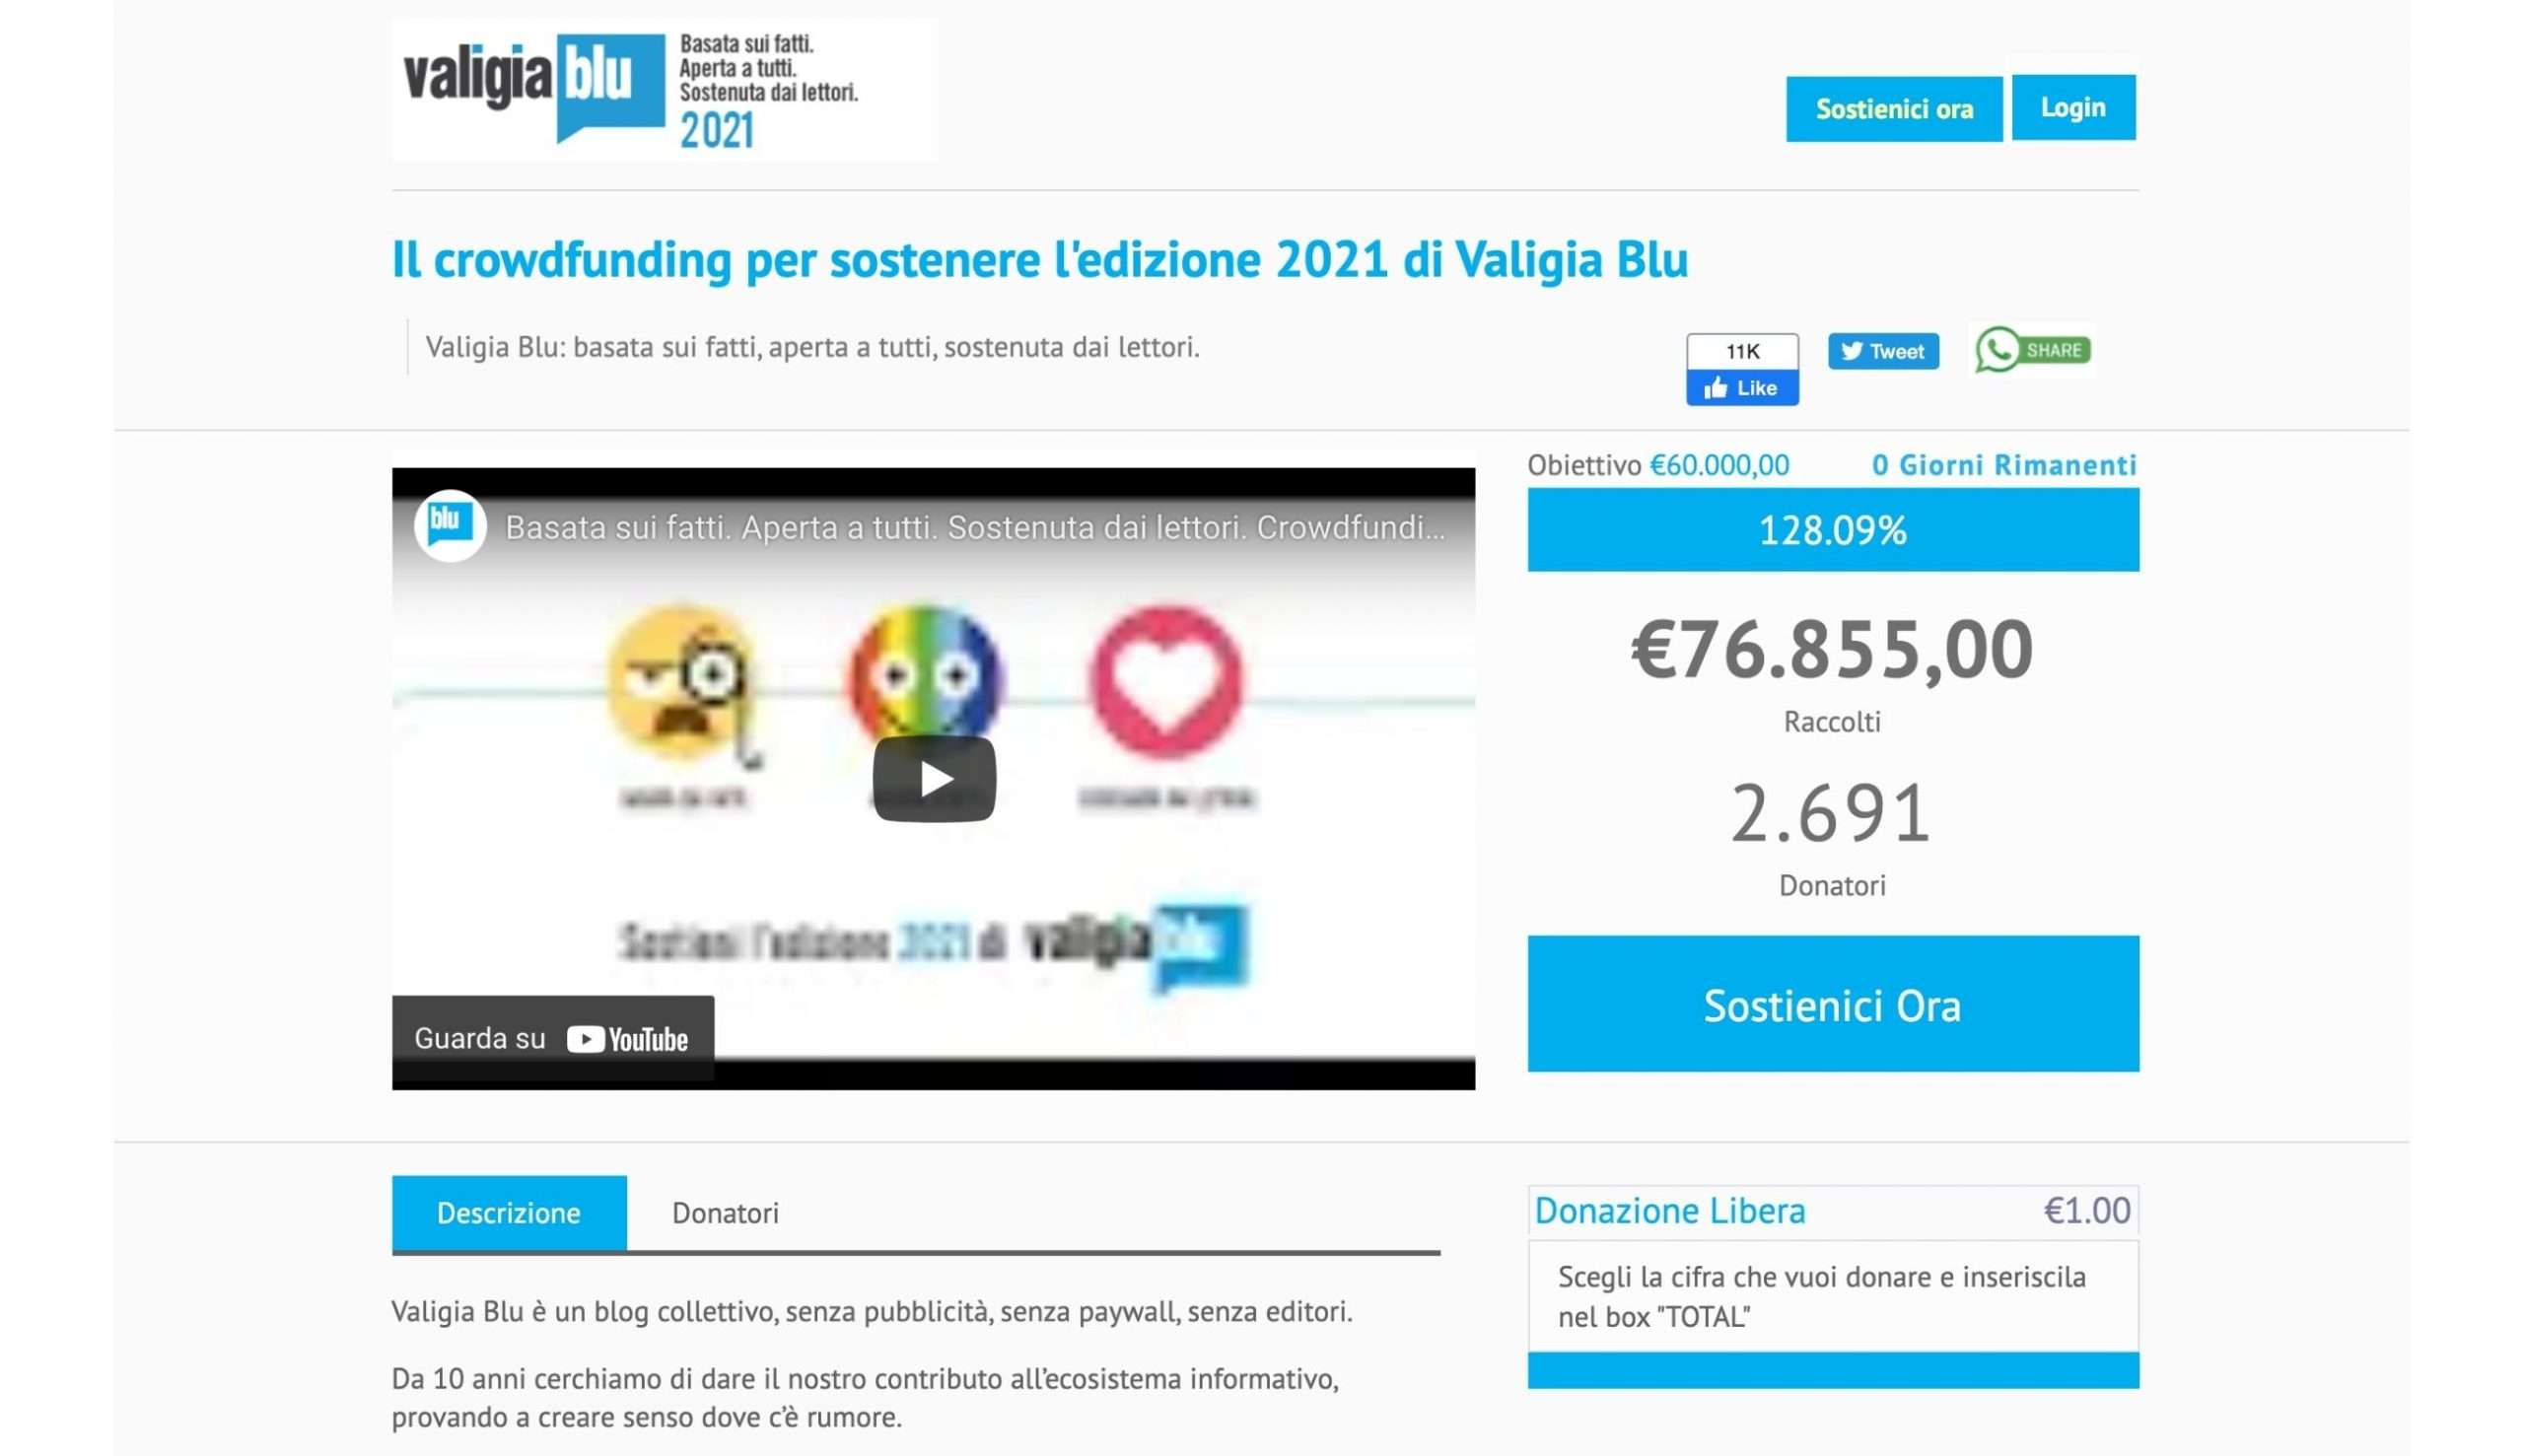 Valigia Blu - modelli di business - crowdfunding